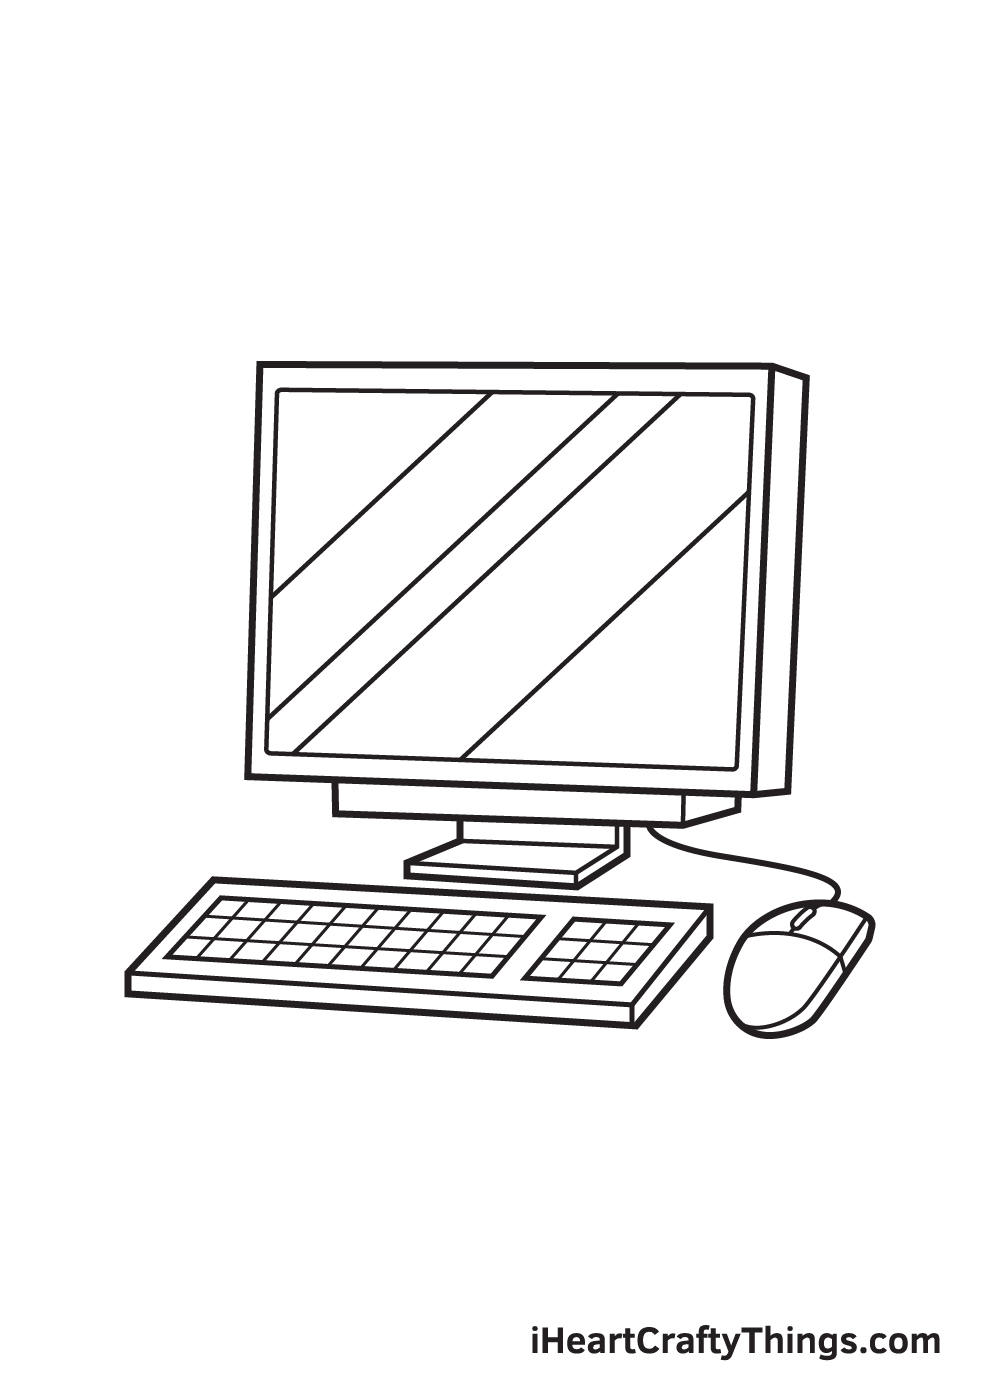 computer drawing - step 9